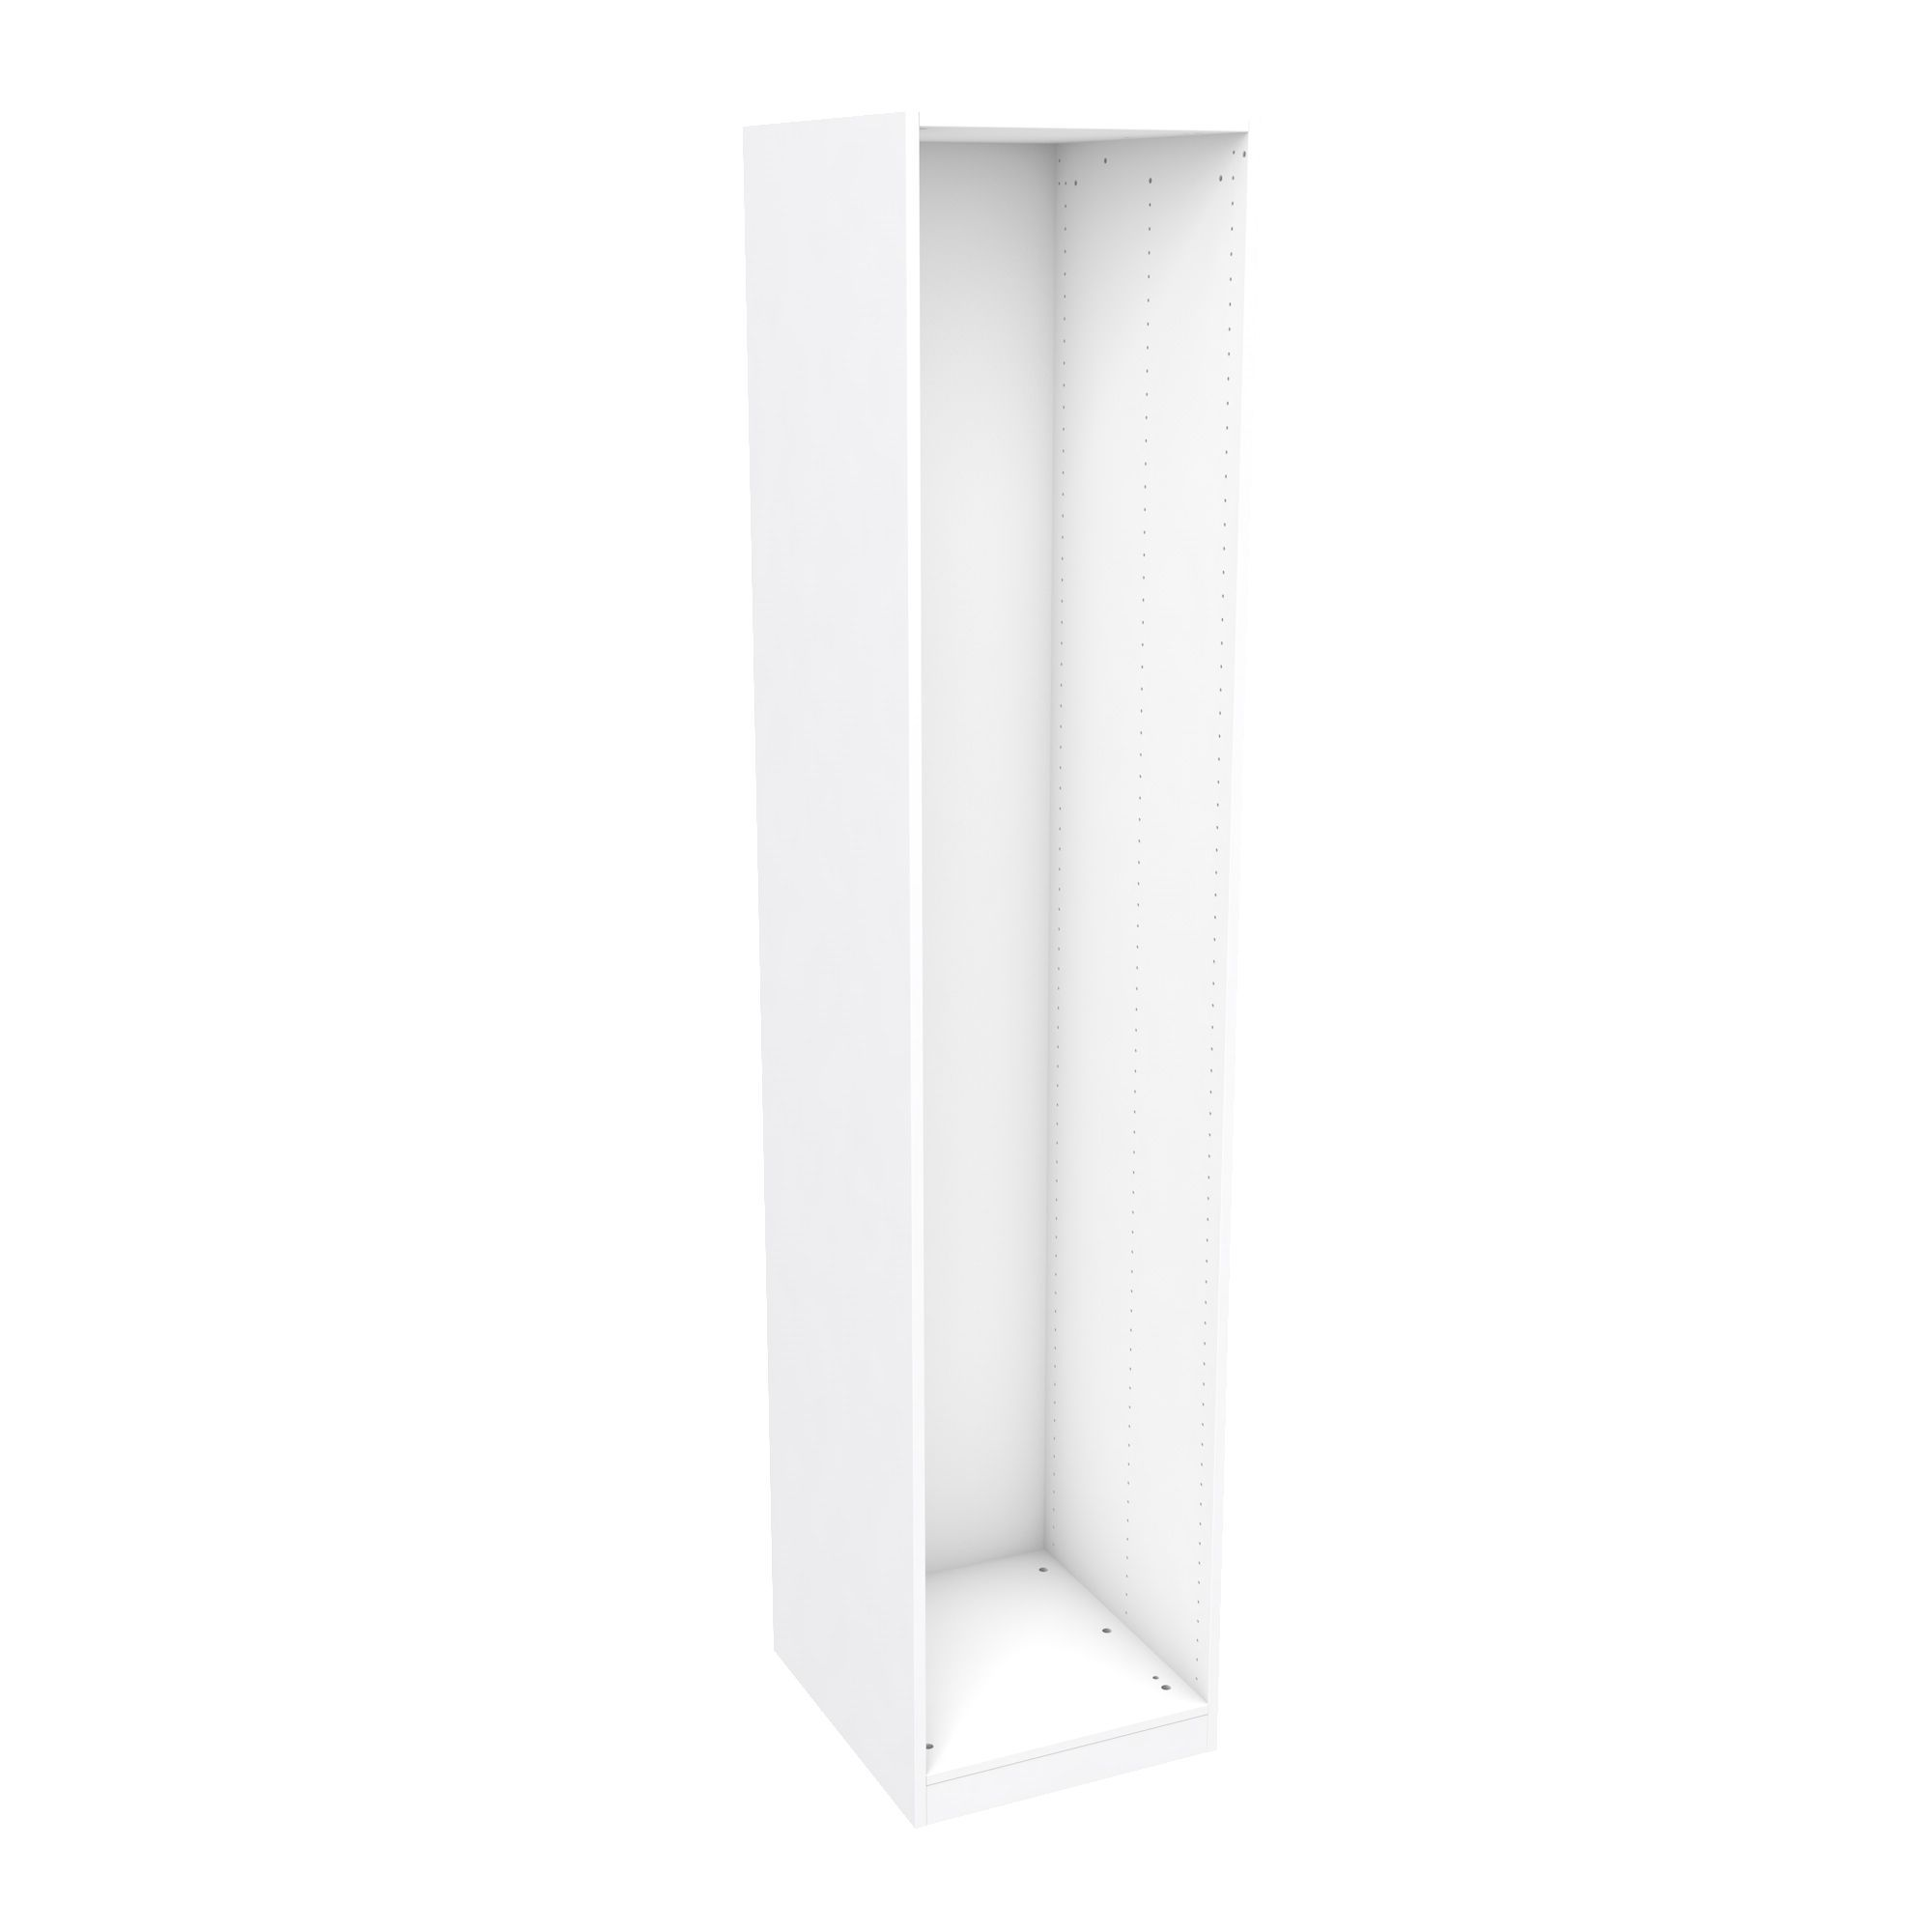 Darwin Modular White Tall Wardrobe Cabinet (h)2356mm (w)500mm (d)566mm